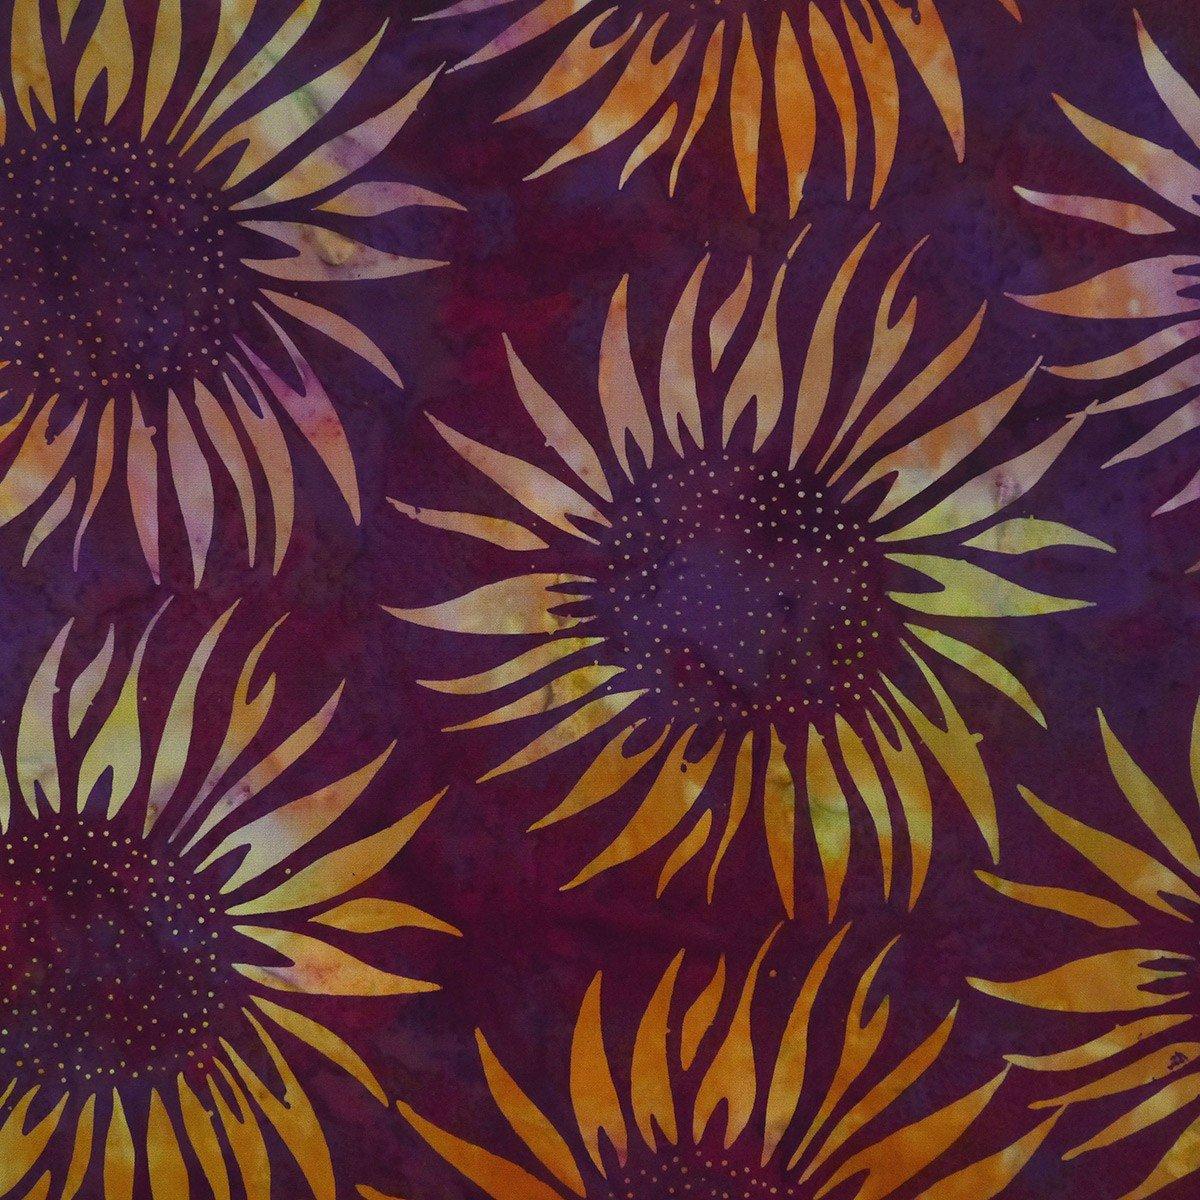 Cornucopia - Sunflower, Gloxinia - by Batik by Mirah